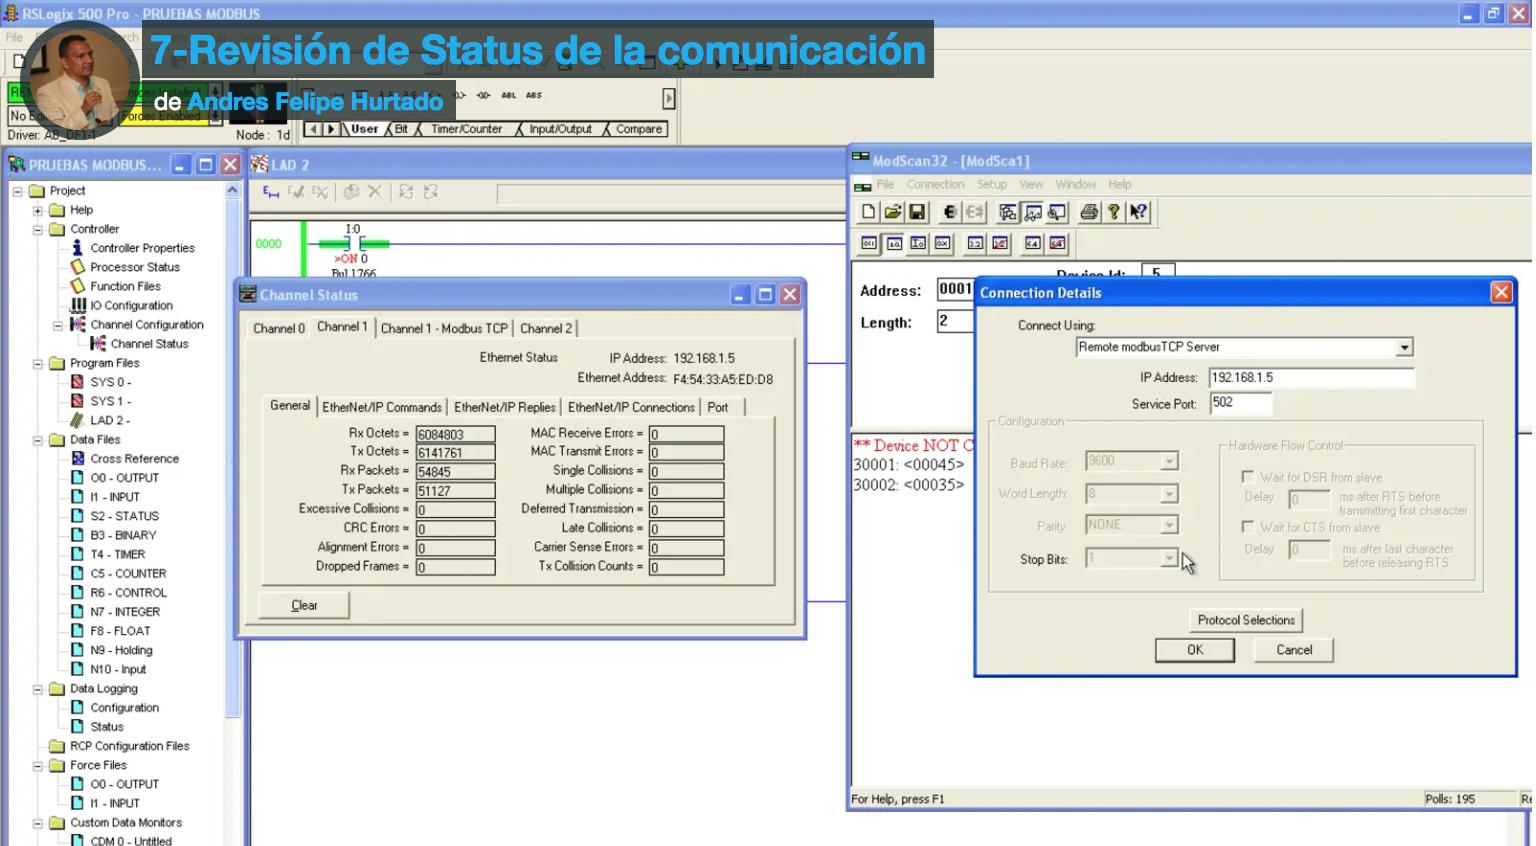 Protocolo Modbus TCP en Micrologix 1400 - eeymuc